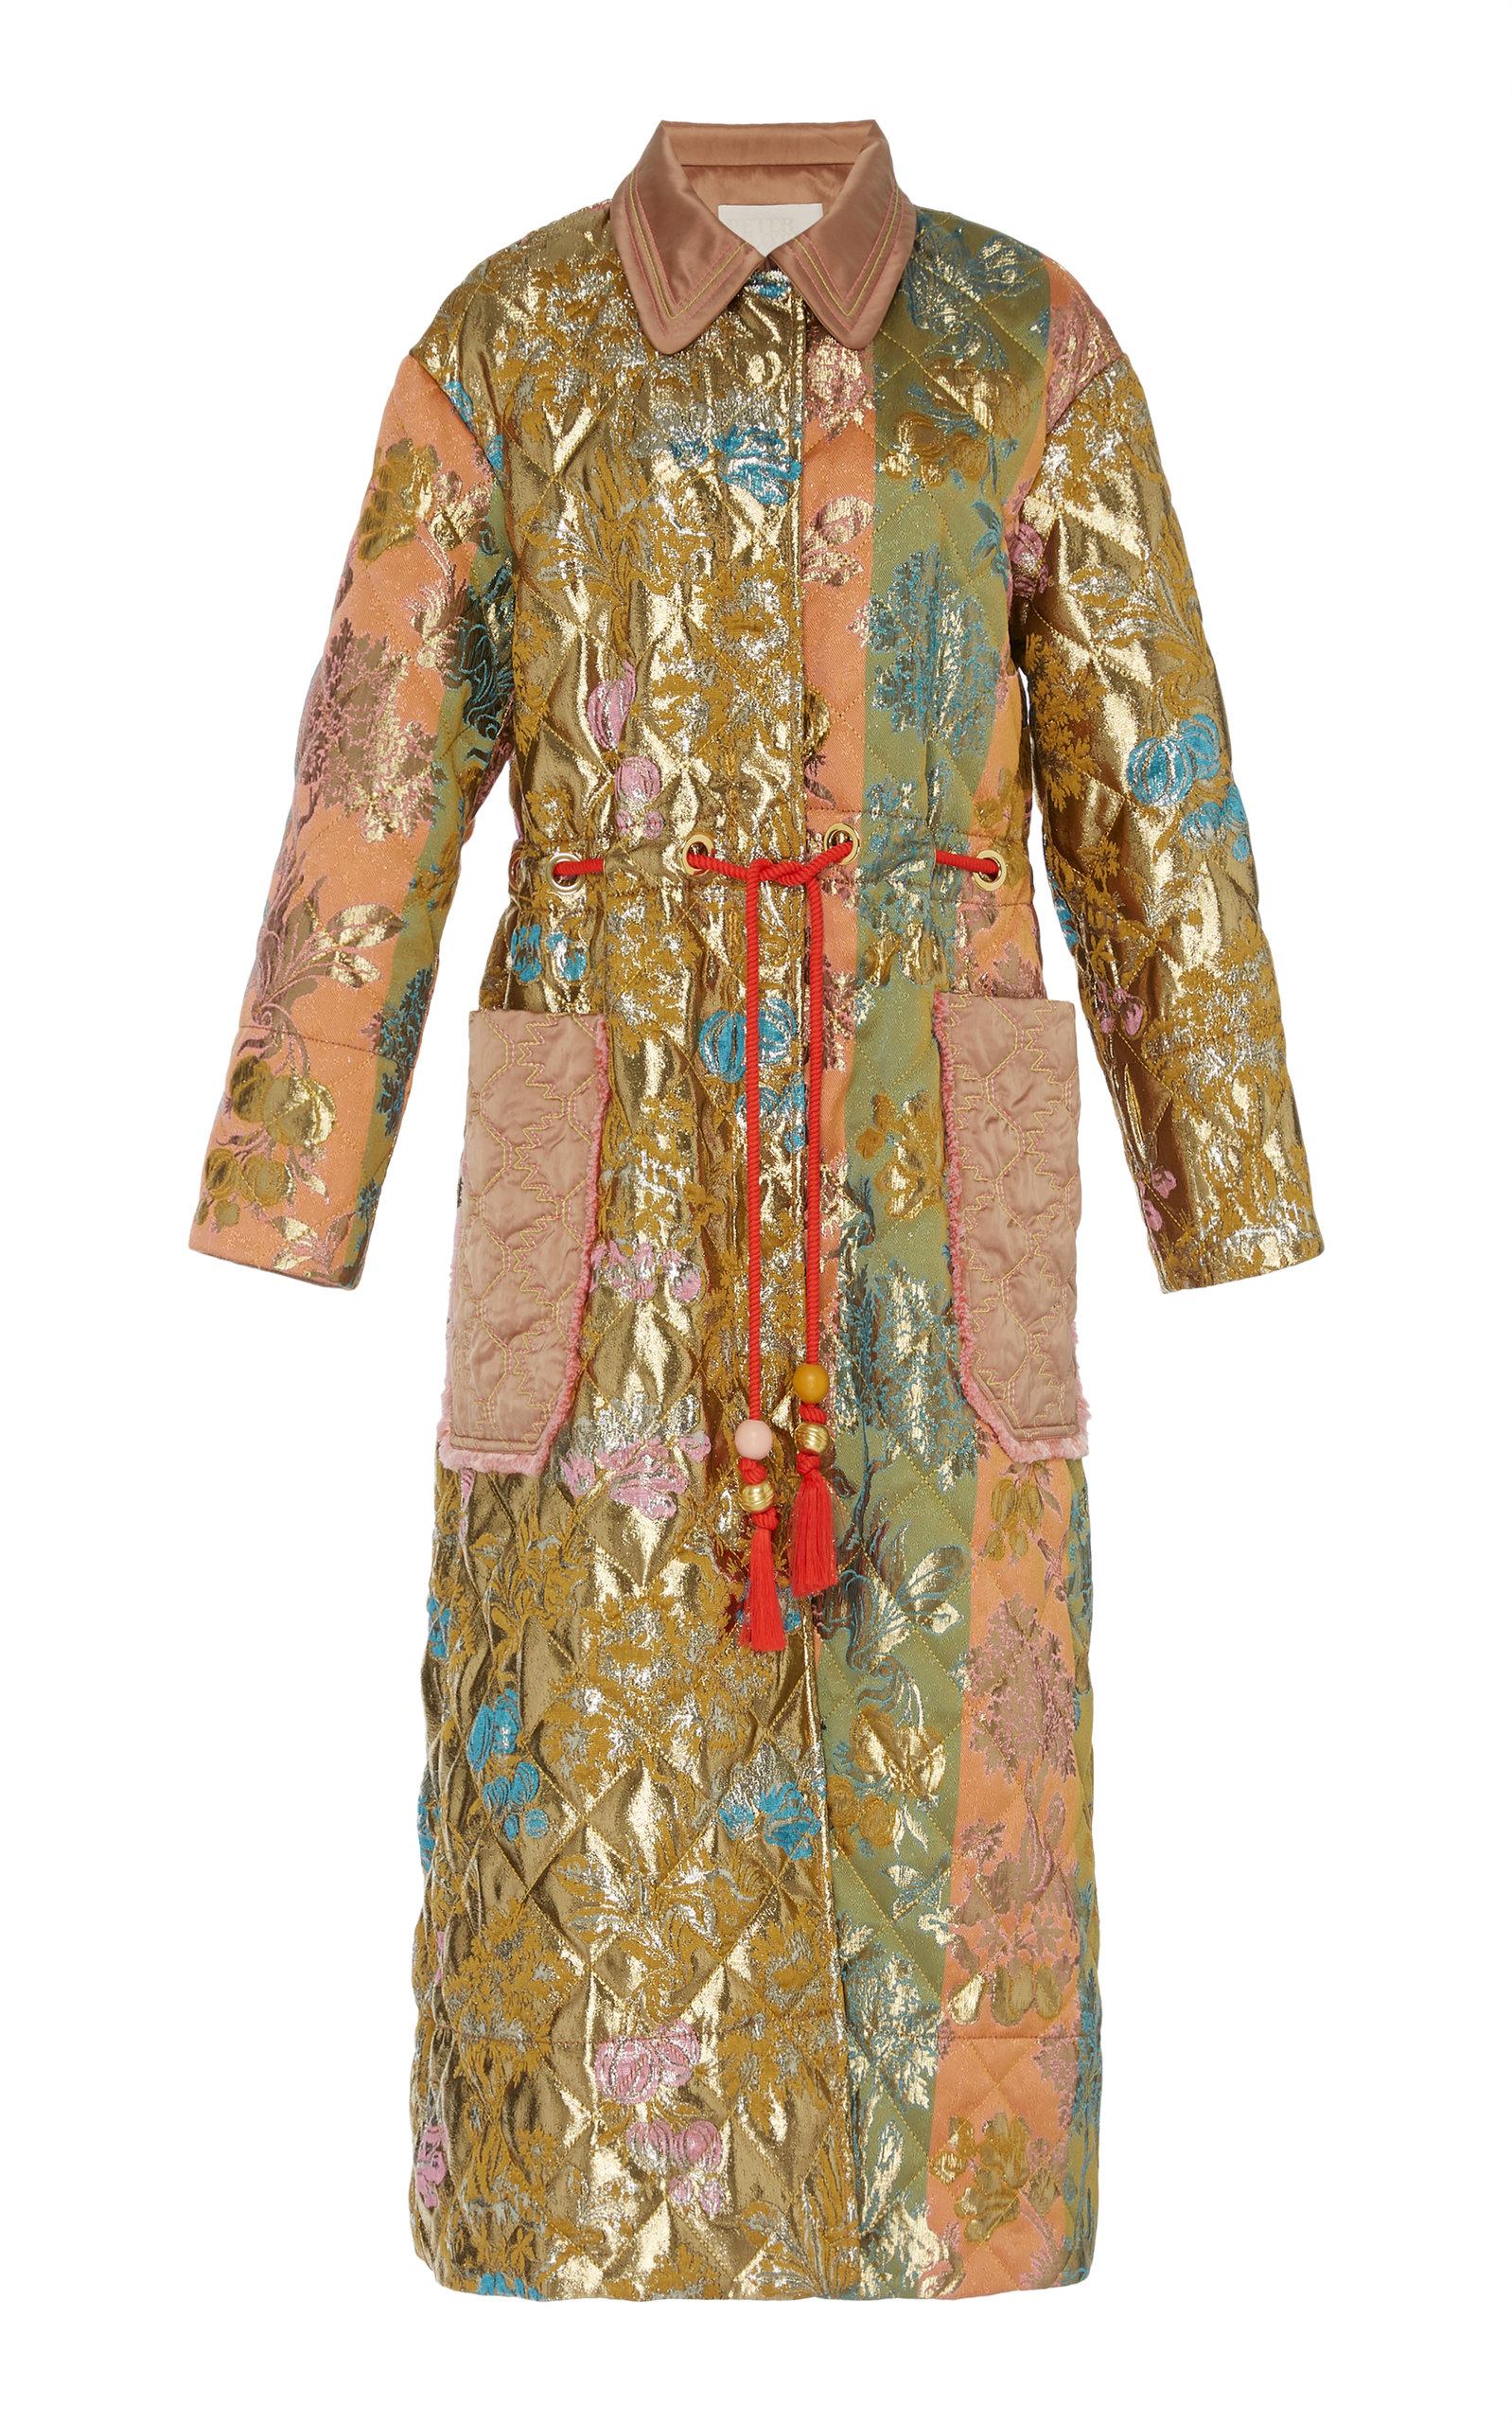 Peter Pilotto metallic jacquard coat Choice Sale Online Best Store To Get Sale Online CNxsH4q